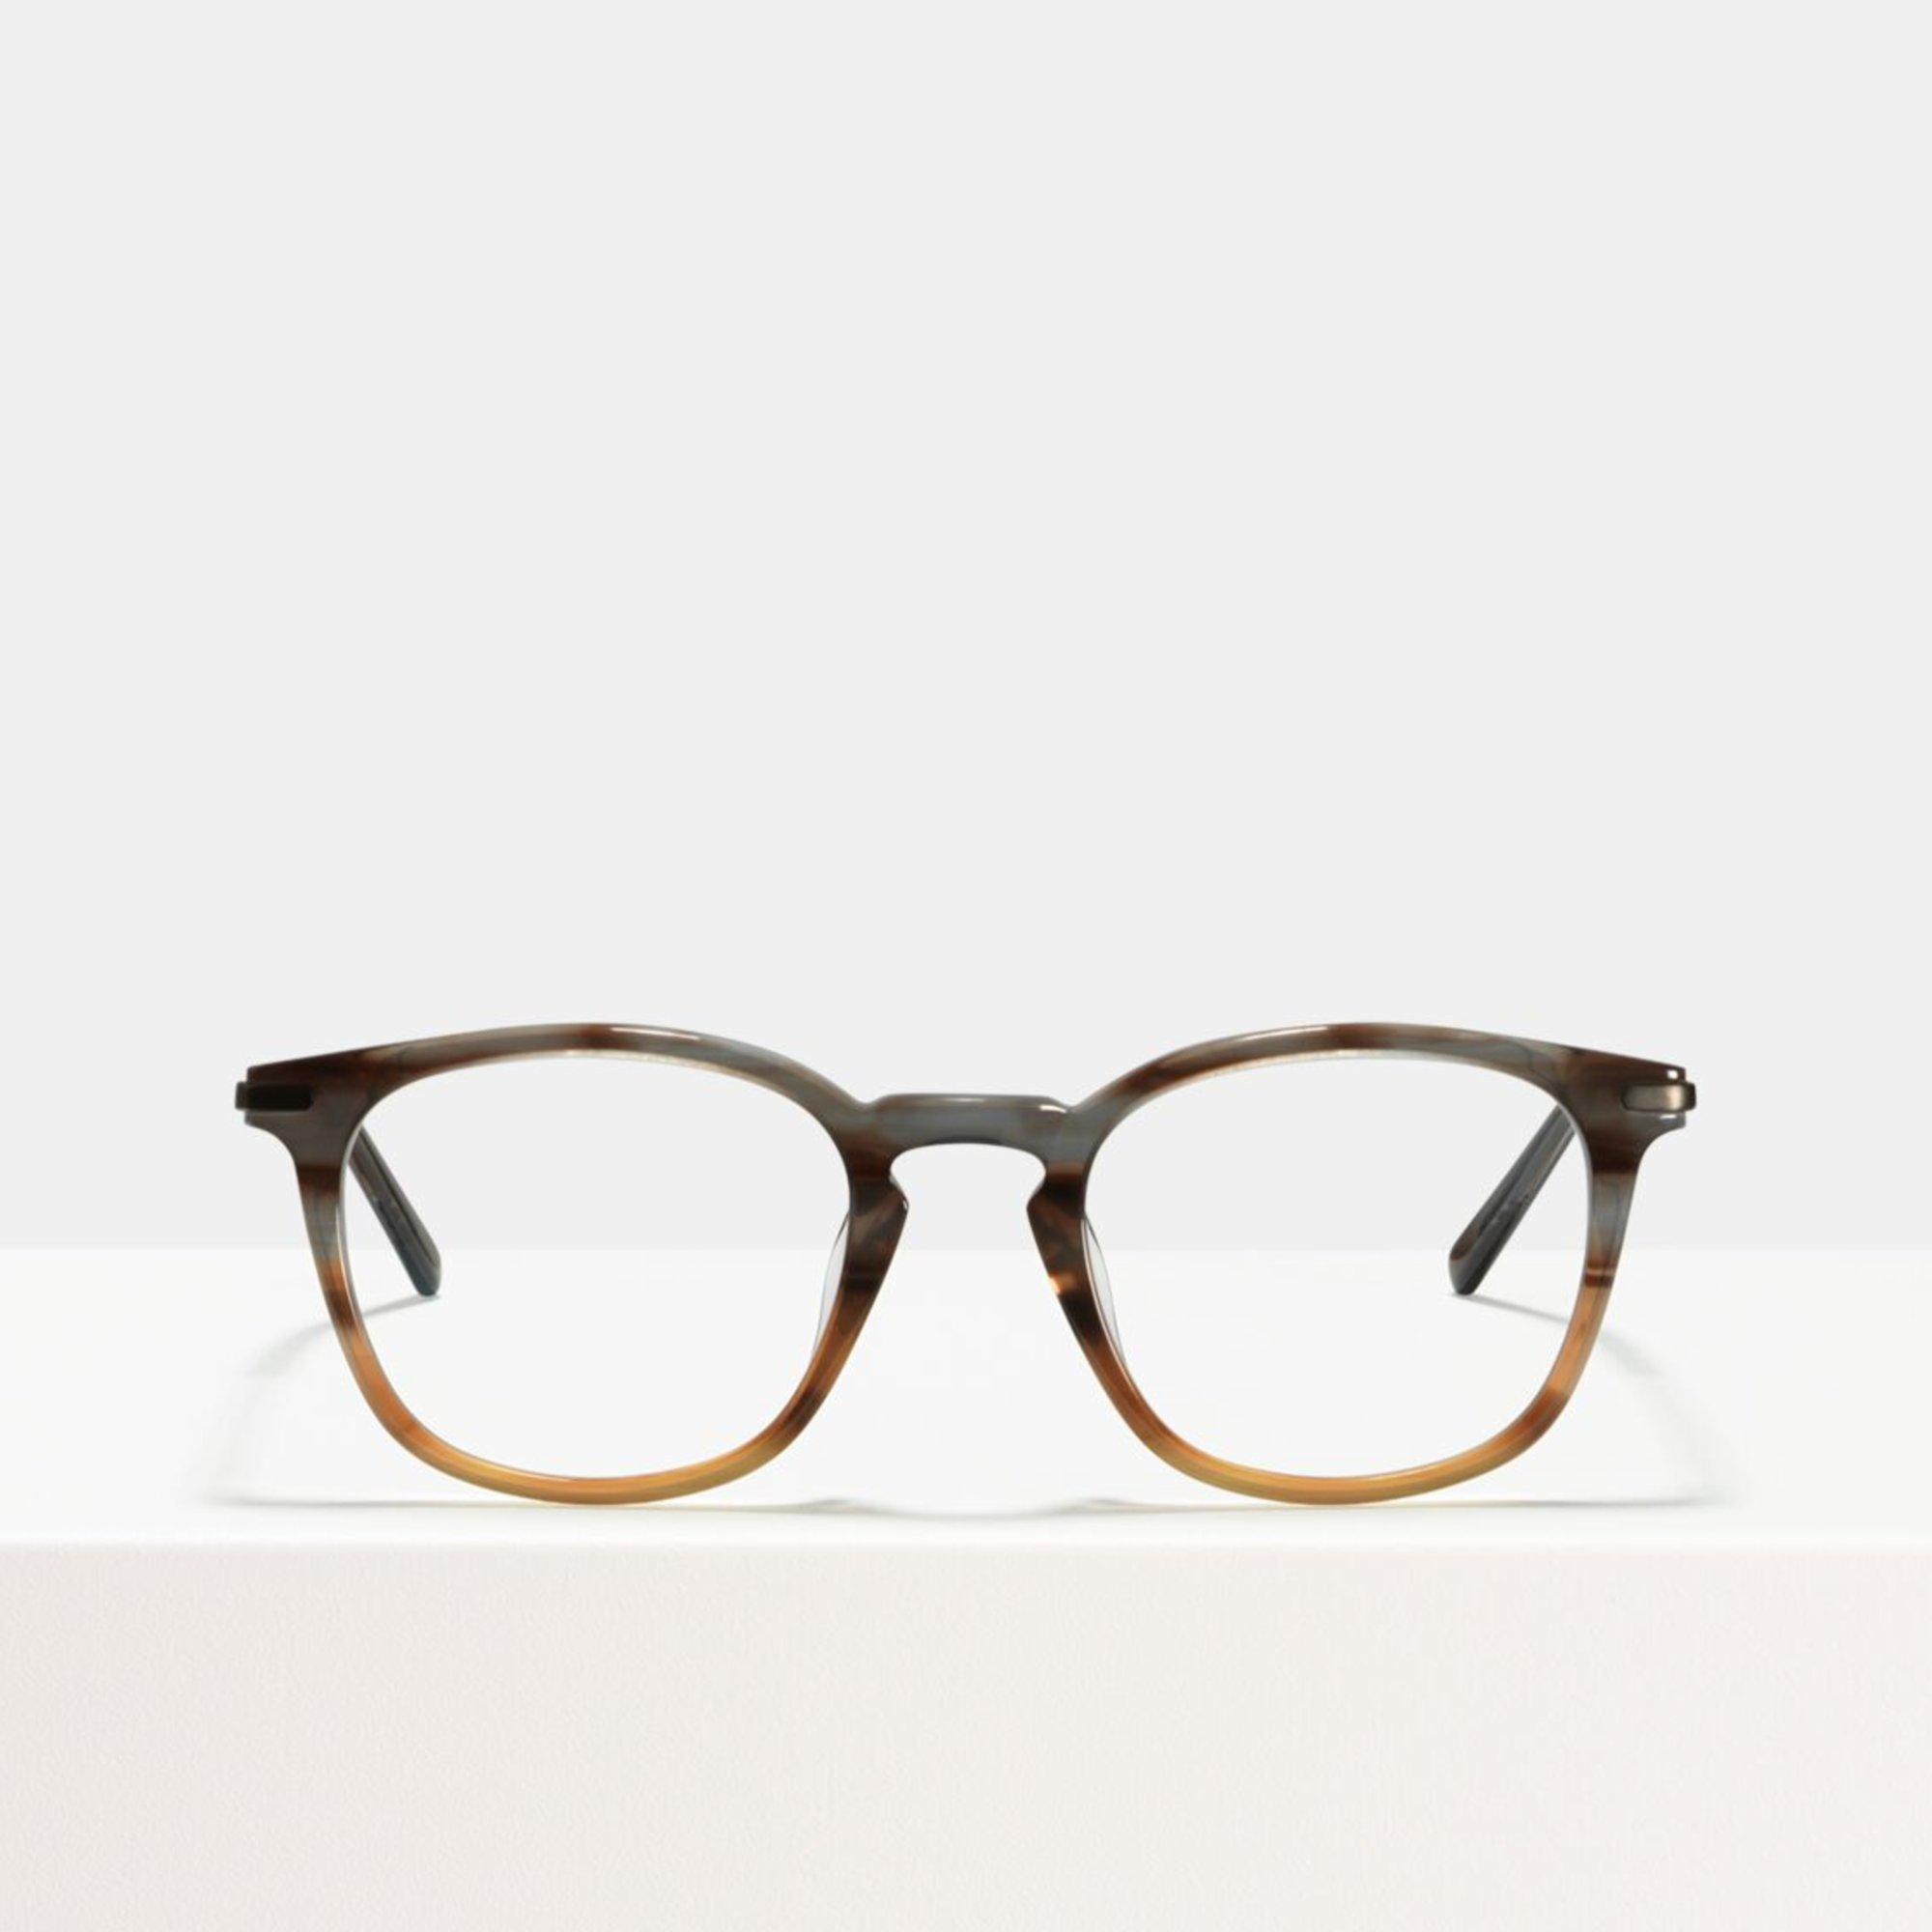 Ace & Tate Glasses | quadratisch Acetat in Grau, Braun, Orange